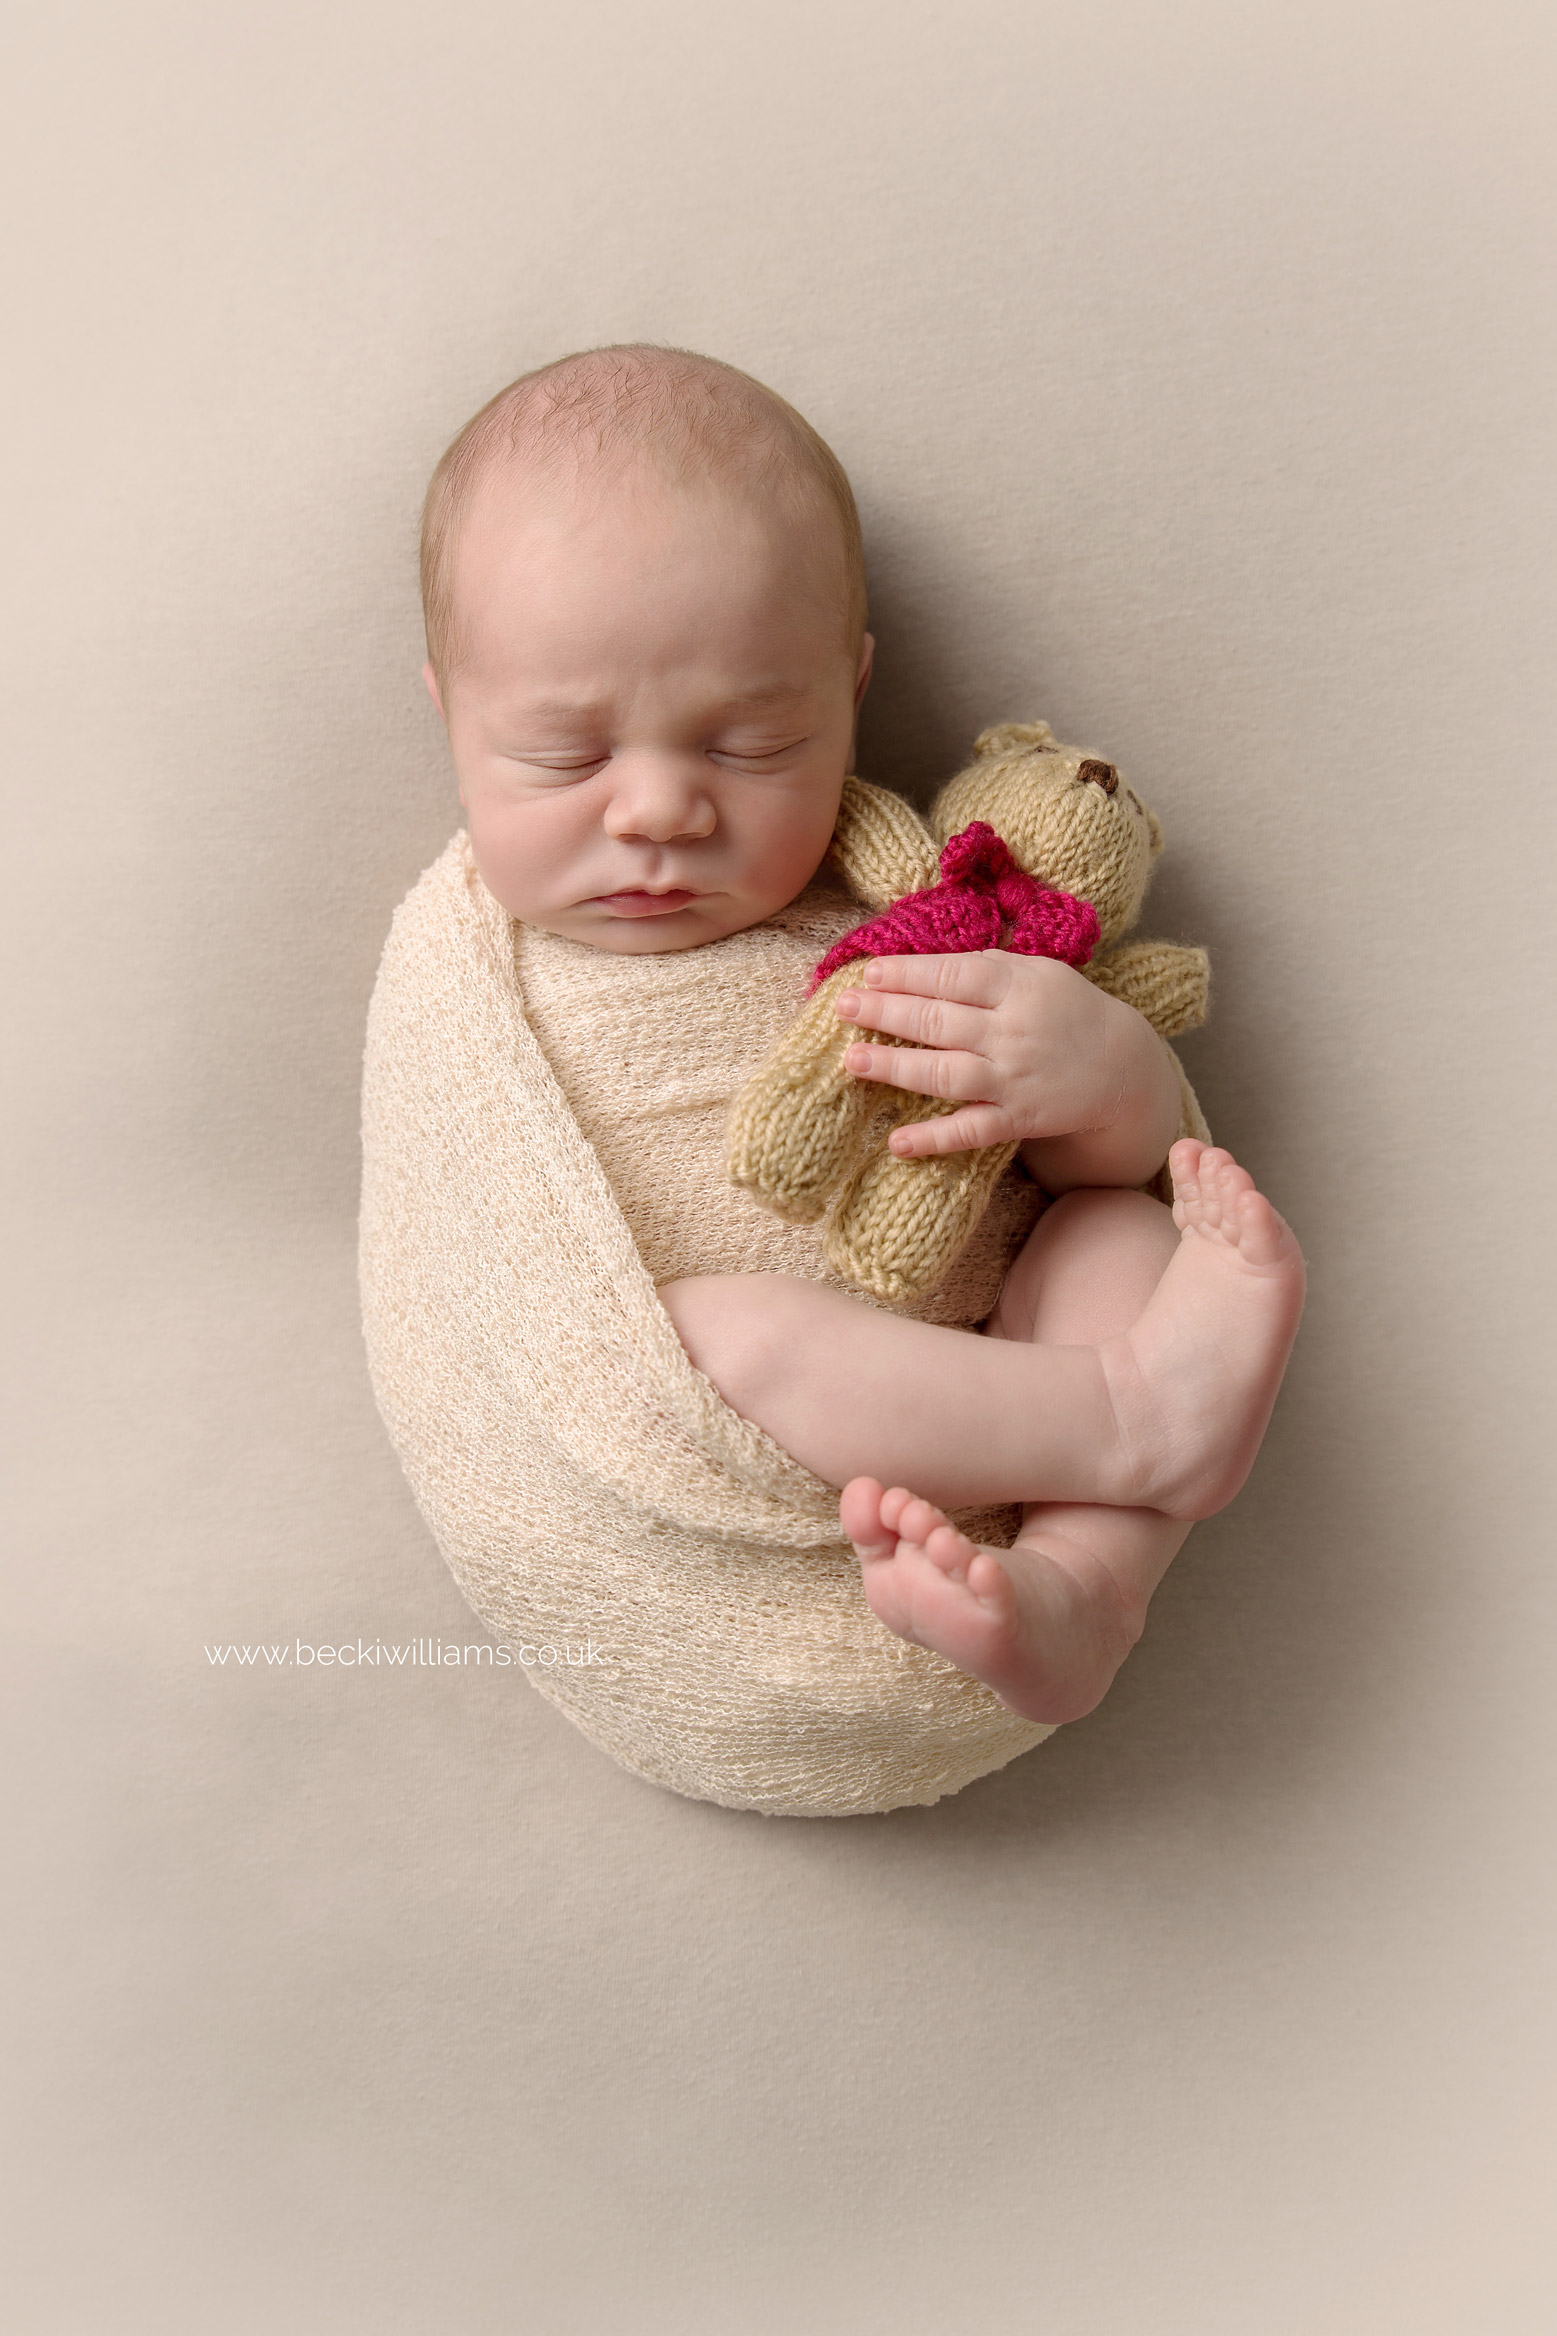 sleeping newborn baby boy wrapped in a cream blanket holding a little teddy dear